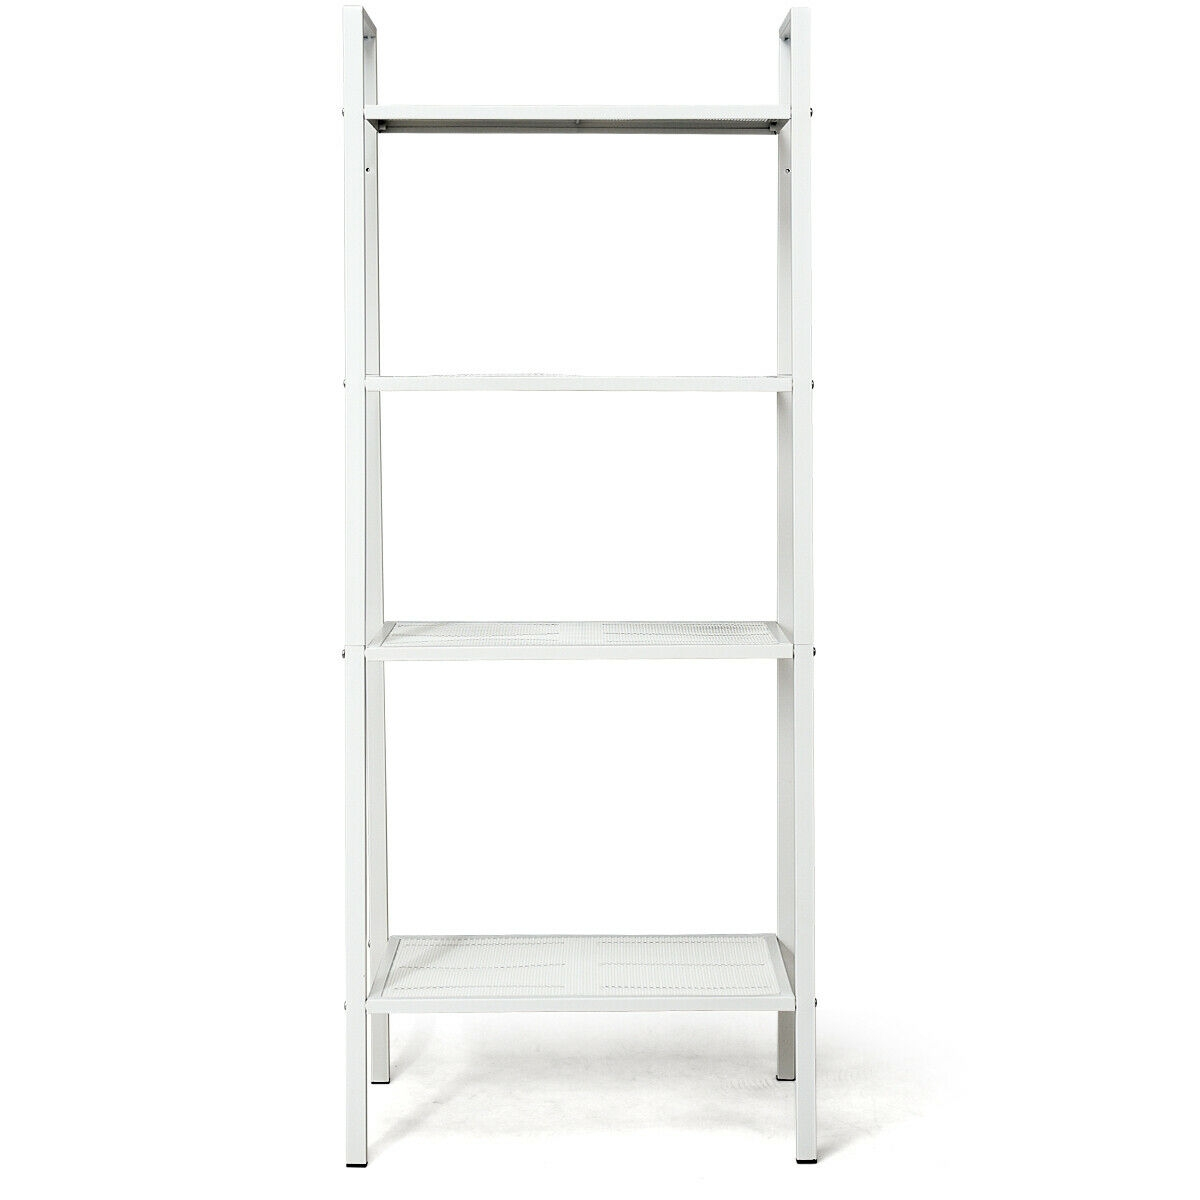 4-Tier Metal Shelf Storage Rack Bookshelf Mesh Layers Display Stand